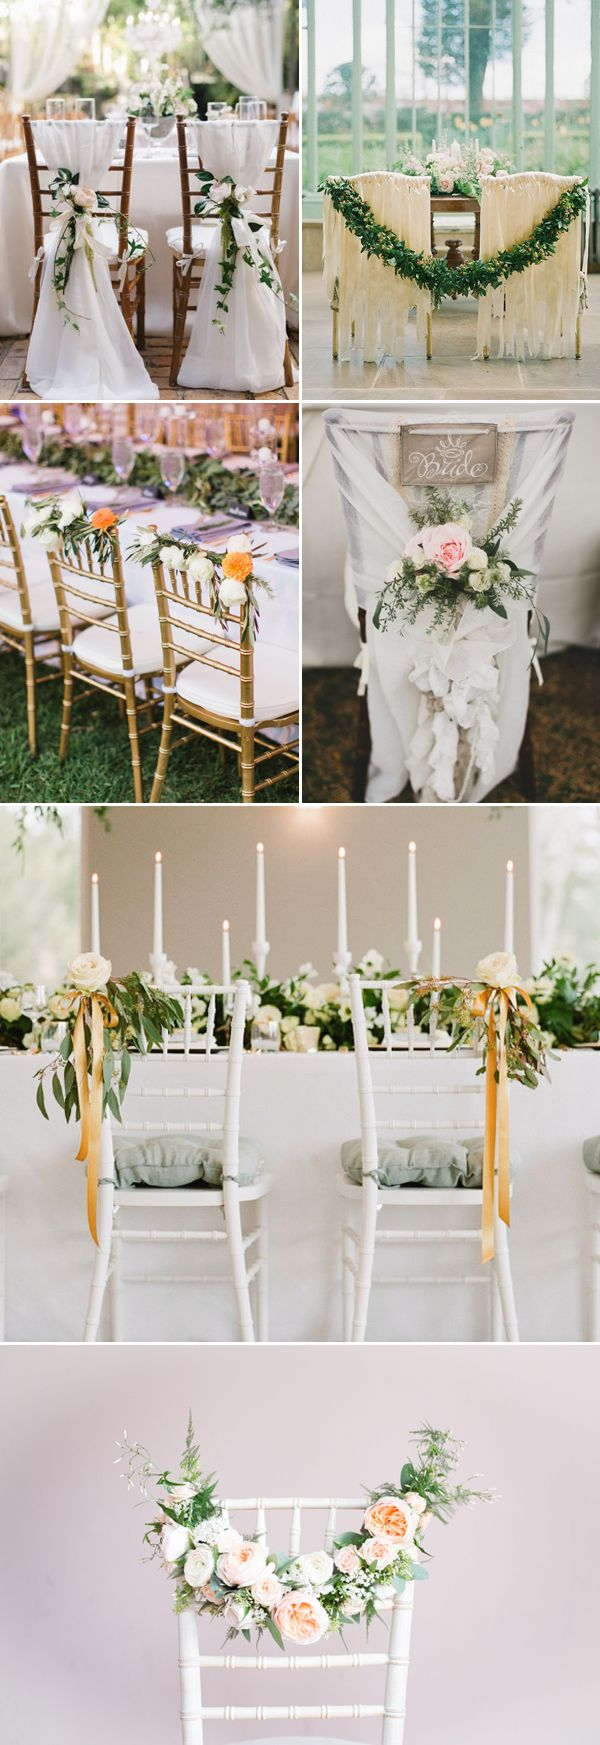 60 best Dove Grey, Blush & White Wedding images on Pinterest ...